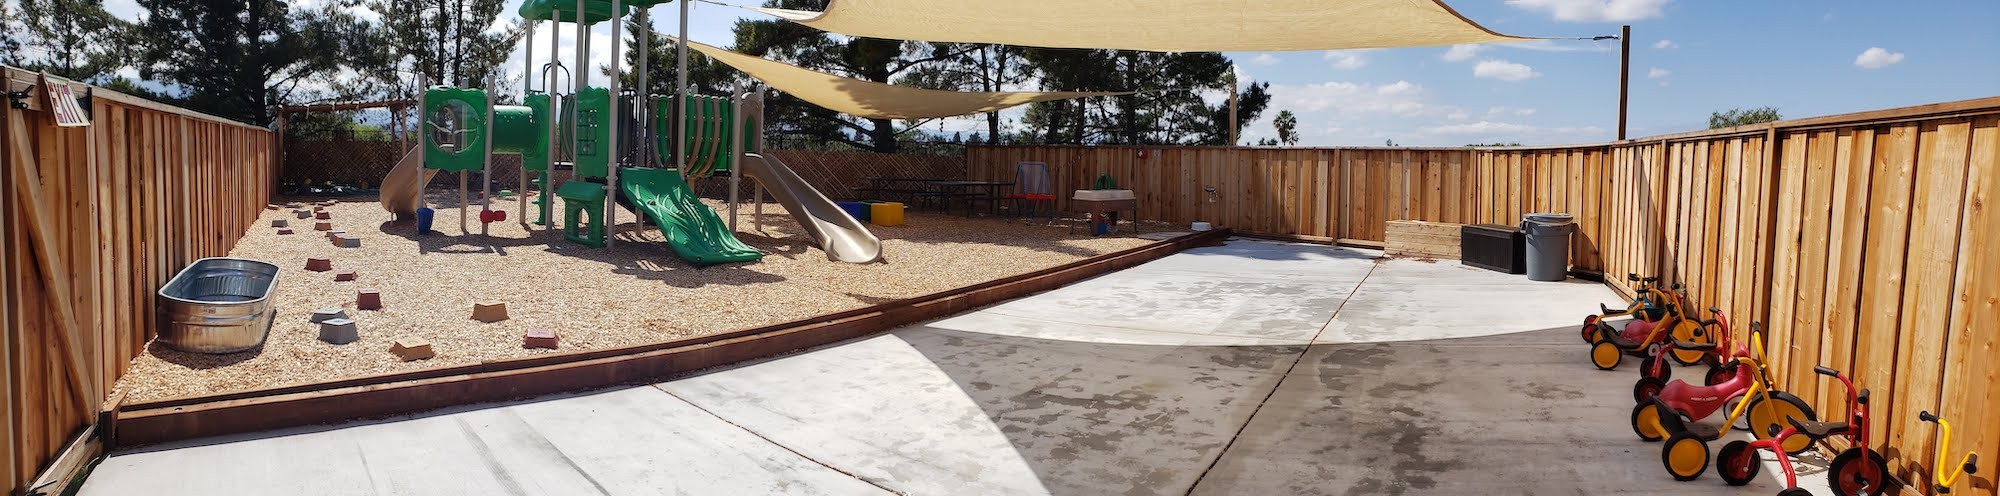 KSS Preschool of Willow Glen Playground